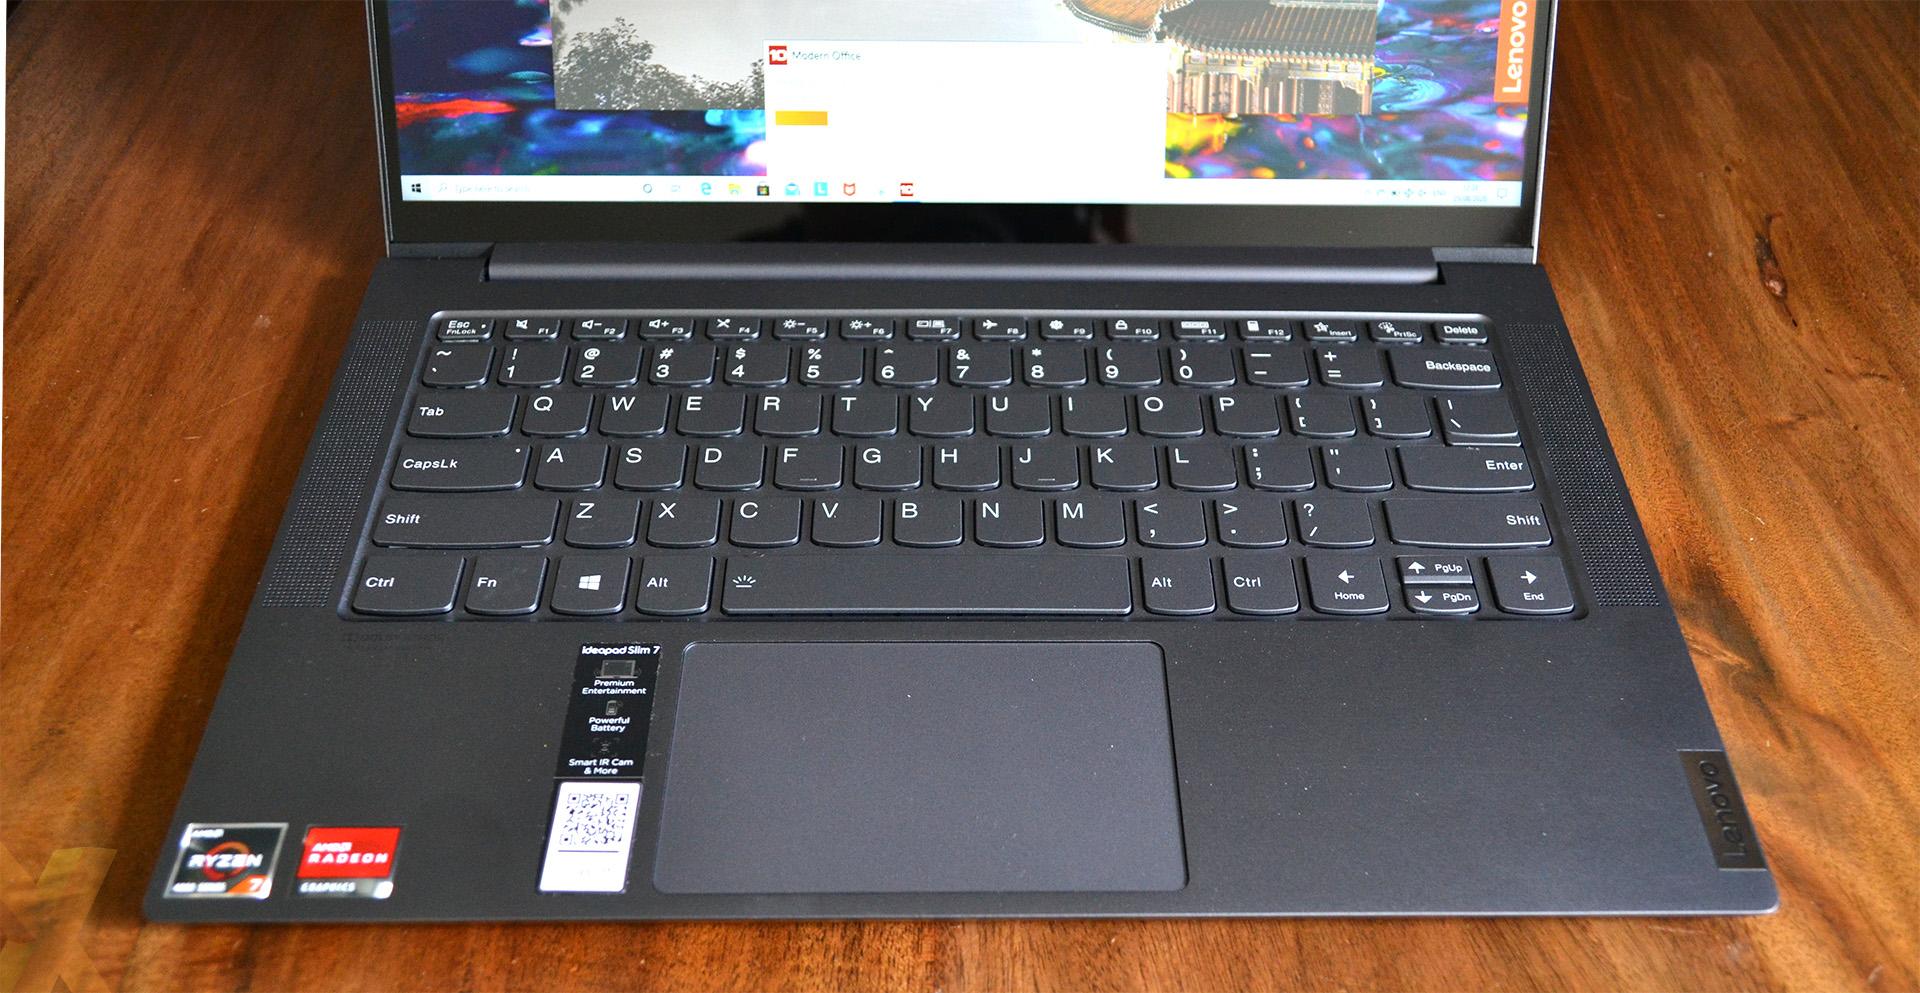 Review Lenovo Yoga Slim 7 Amd Ryzen 7 4800u Laptop Hexus Net